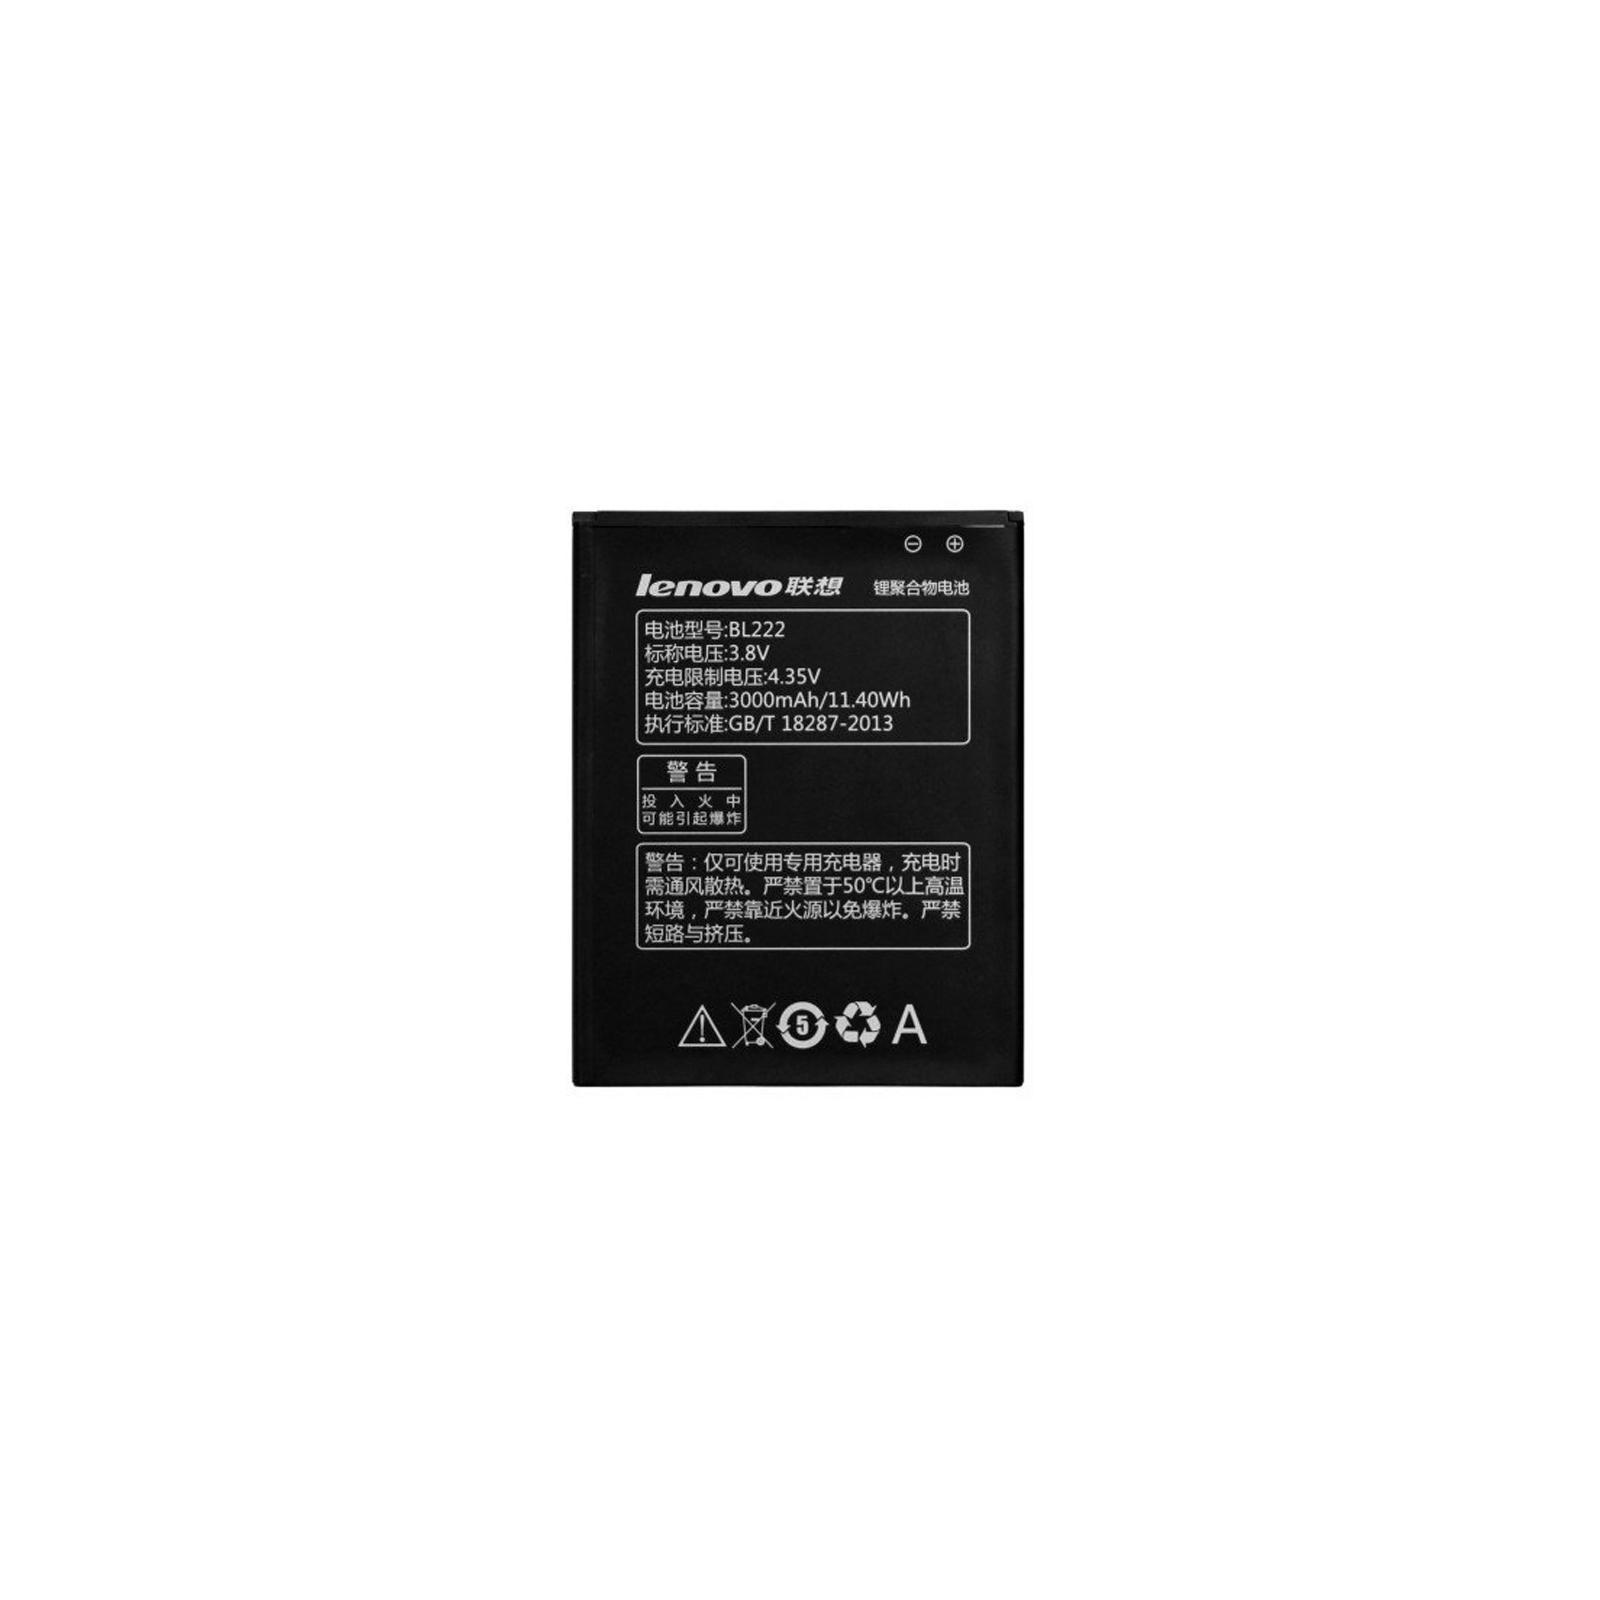 Аккумуляторная батарея Lenovo for S660/S930/S939 (BL-222 / 31746)